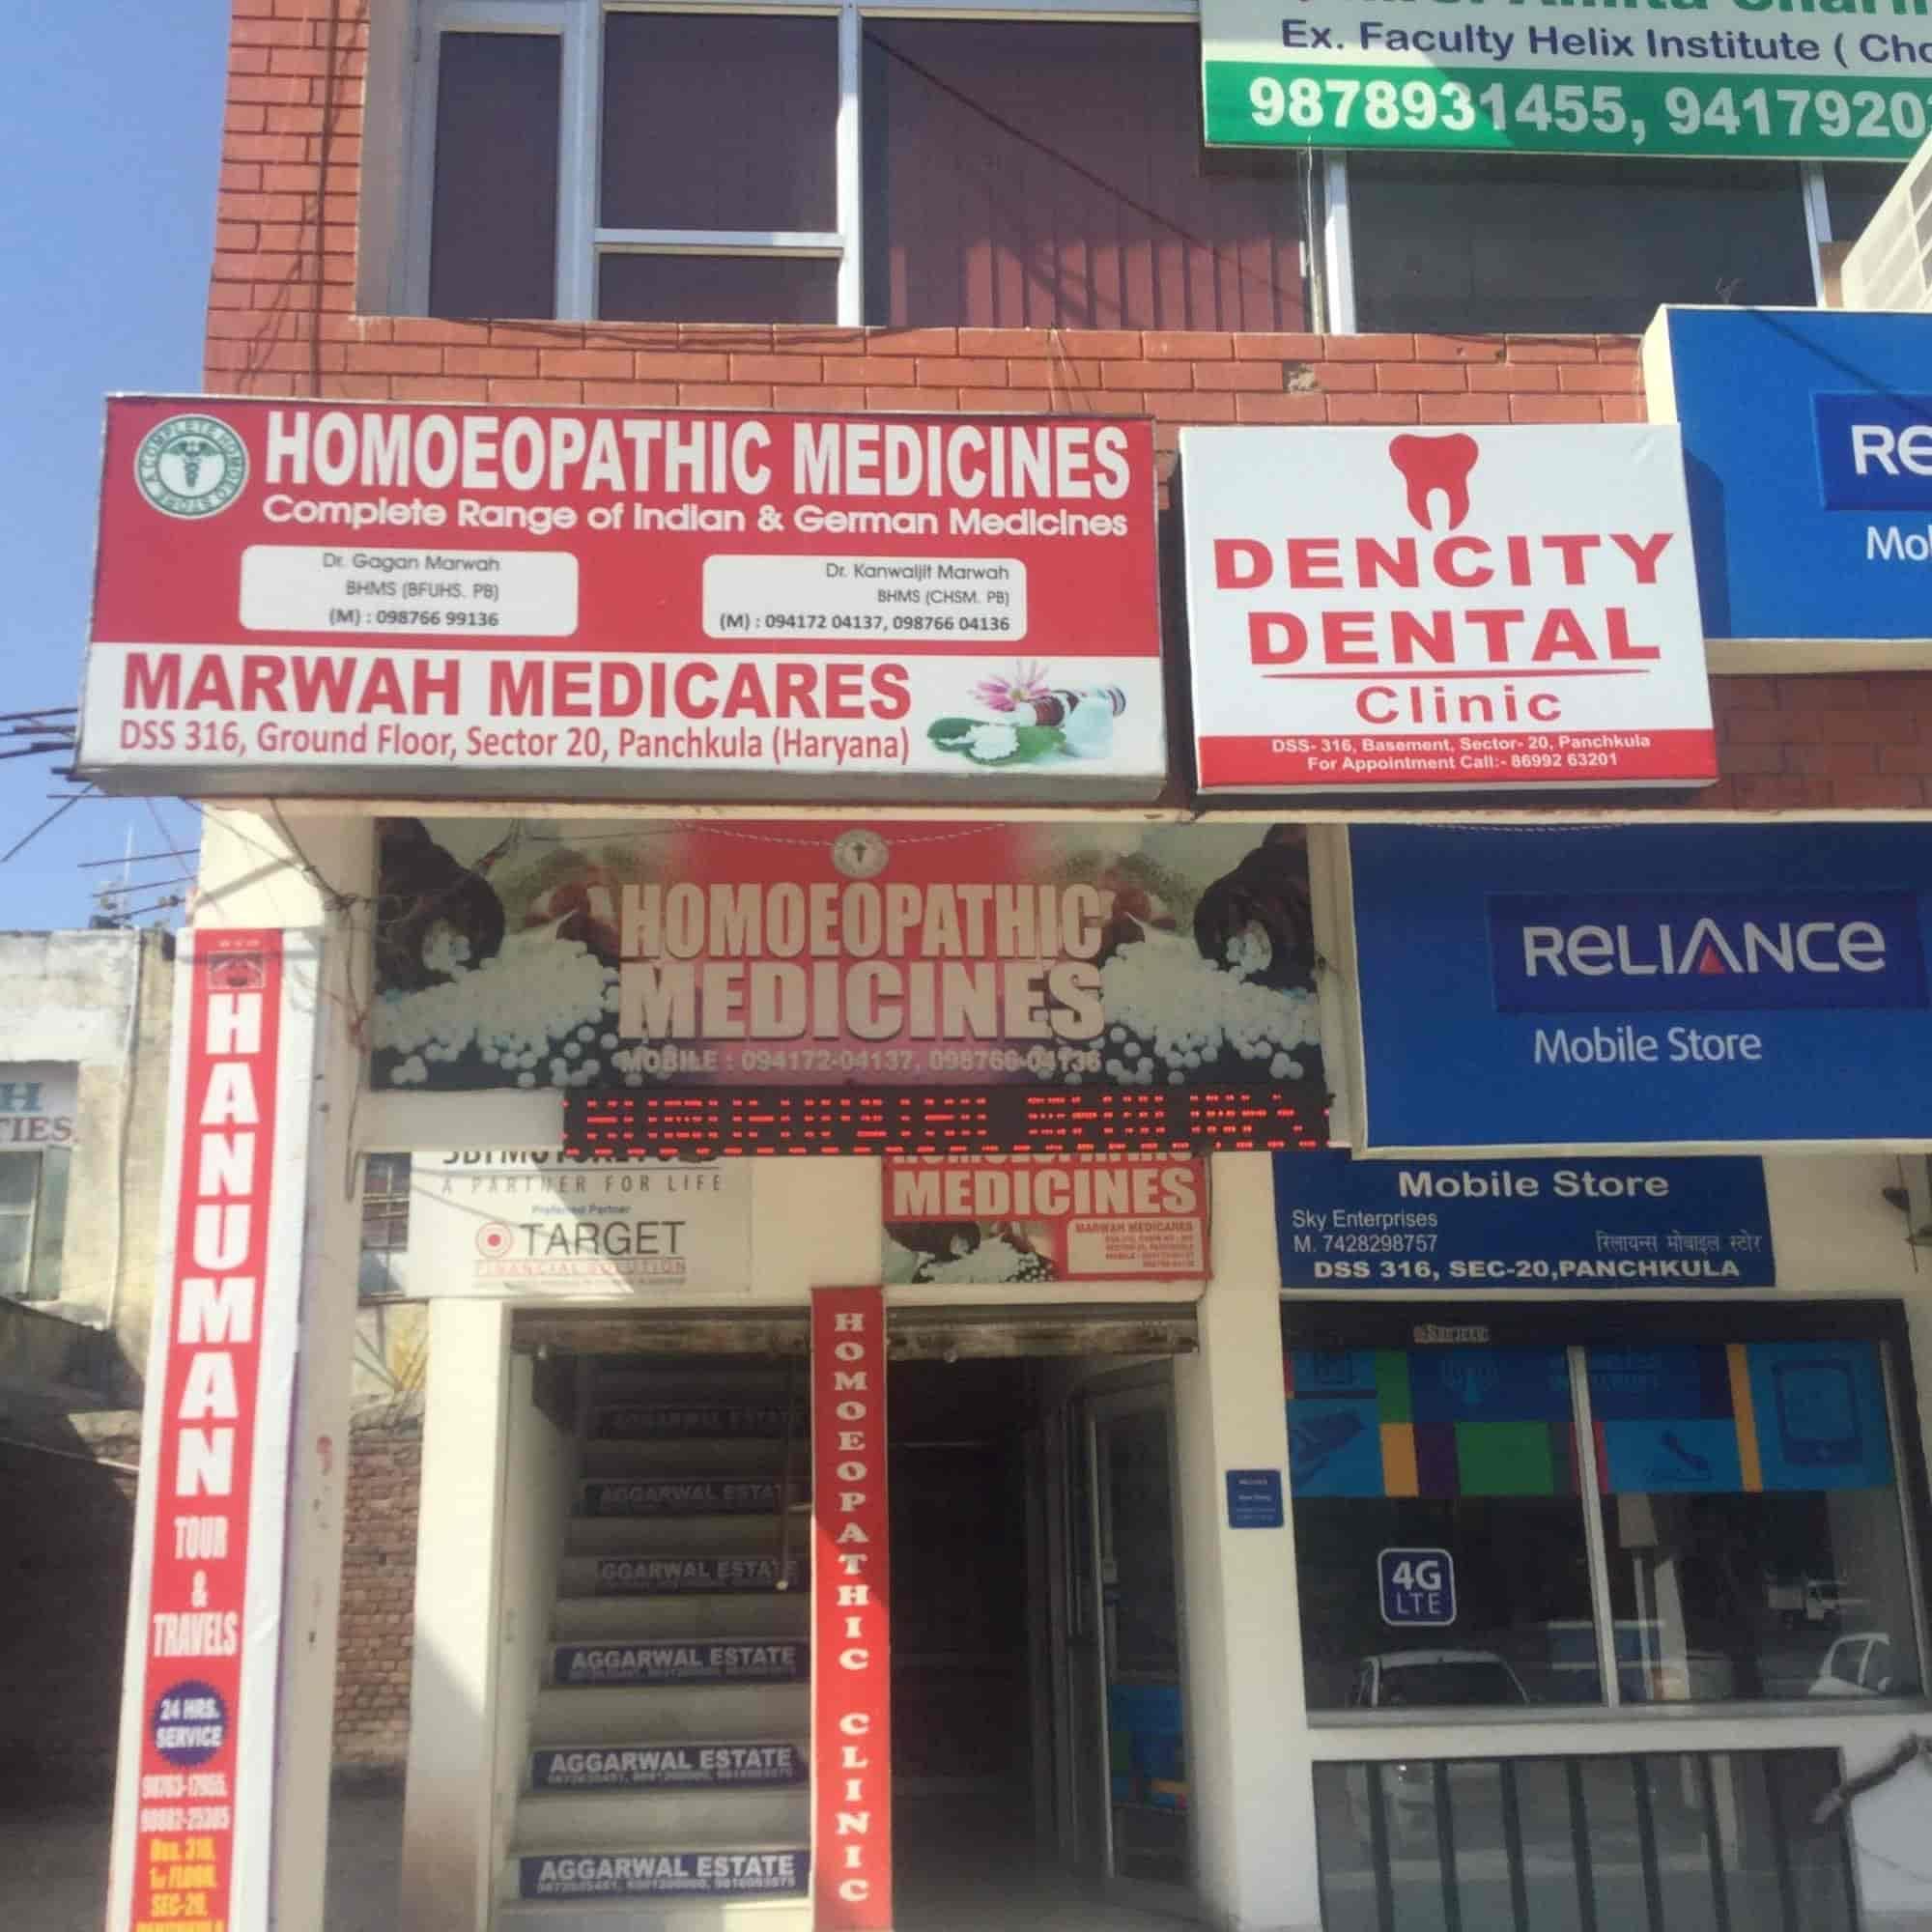 Dr Kanwaljit Marwah Photos, Panchkula Sector 20, Chandigarh